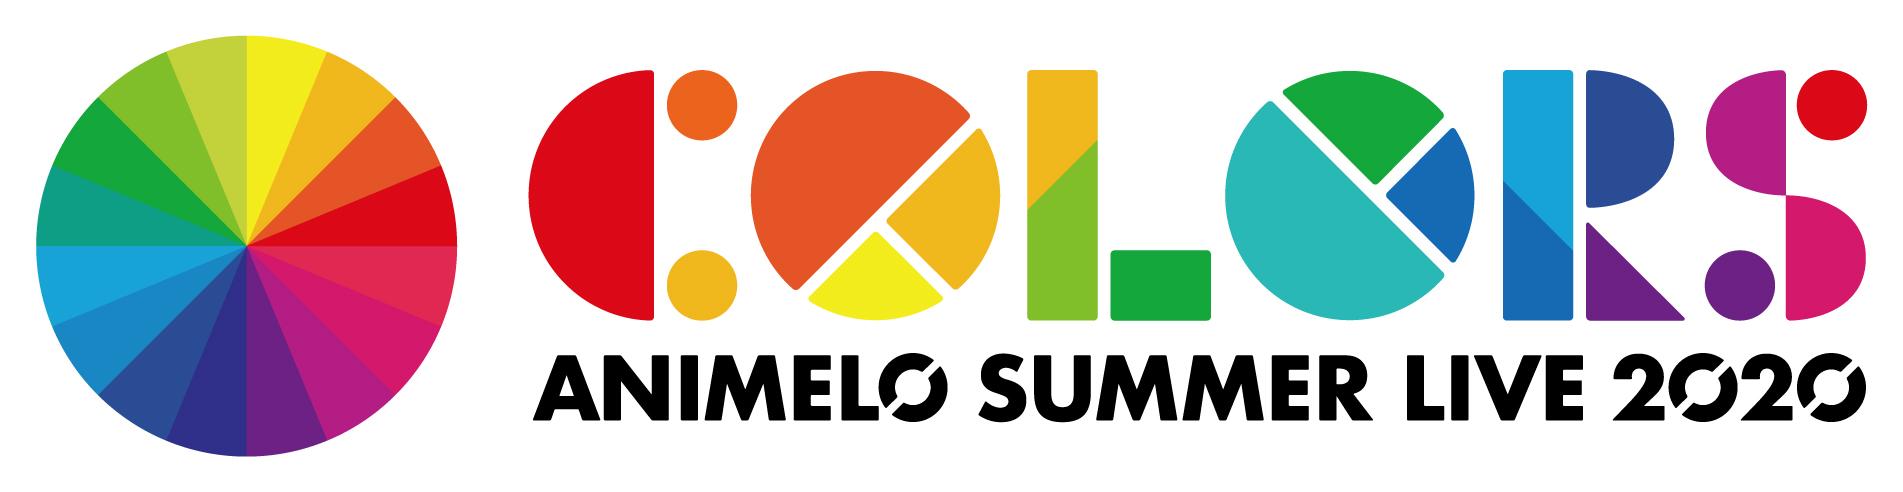 「Animelo Summer Live 2020 -COLORS-」にArgonavisの出演決定!